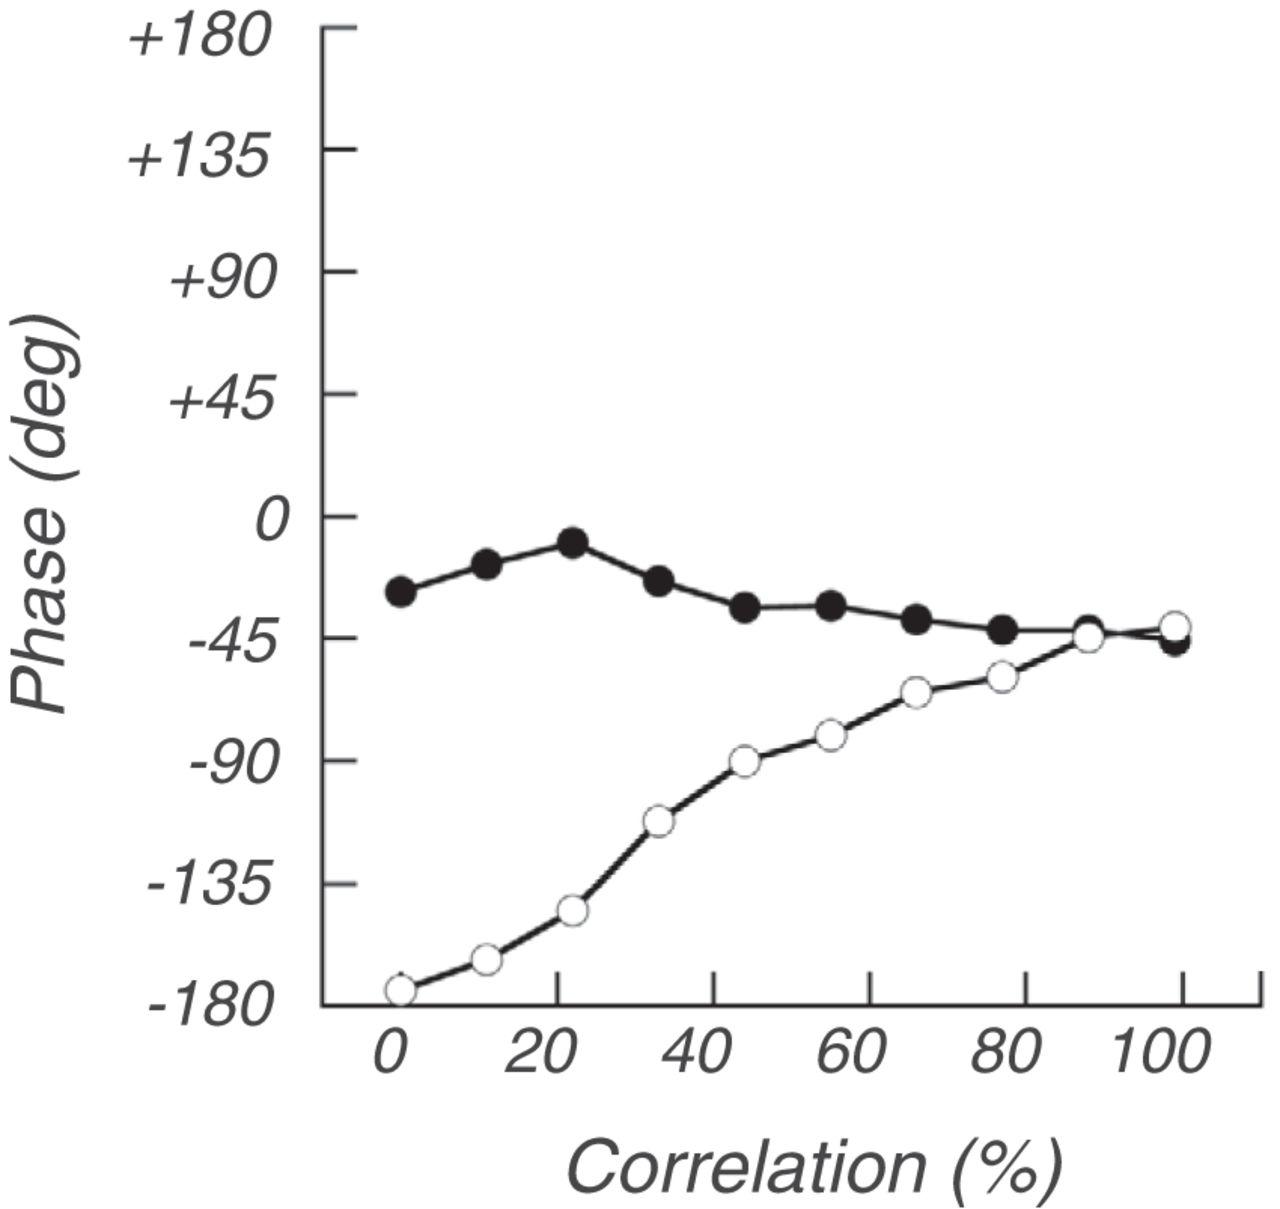 Development Of Relative Disparity Sensitivity In Human Visual Cortex